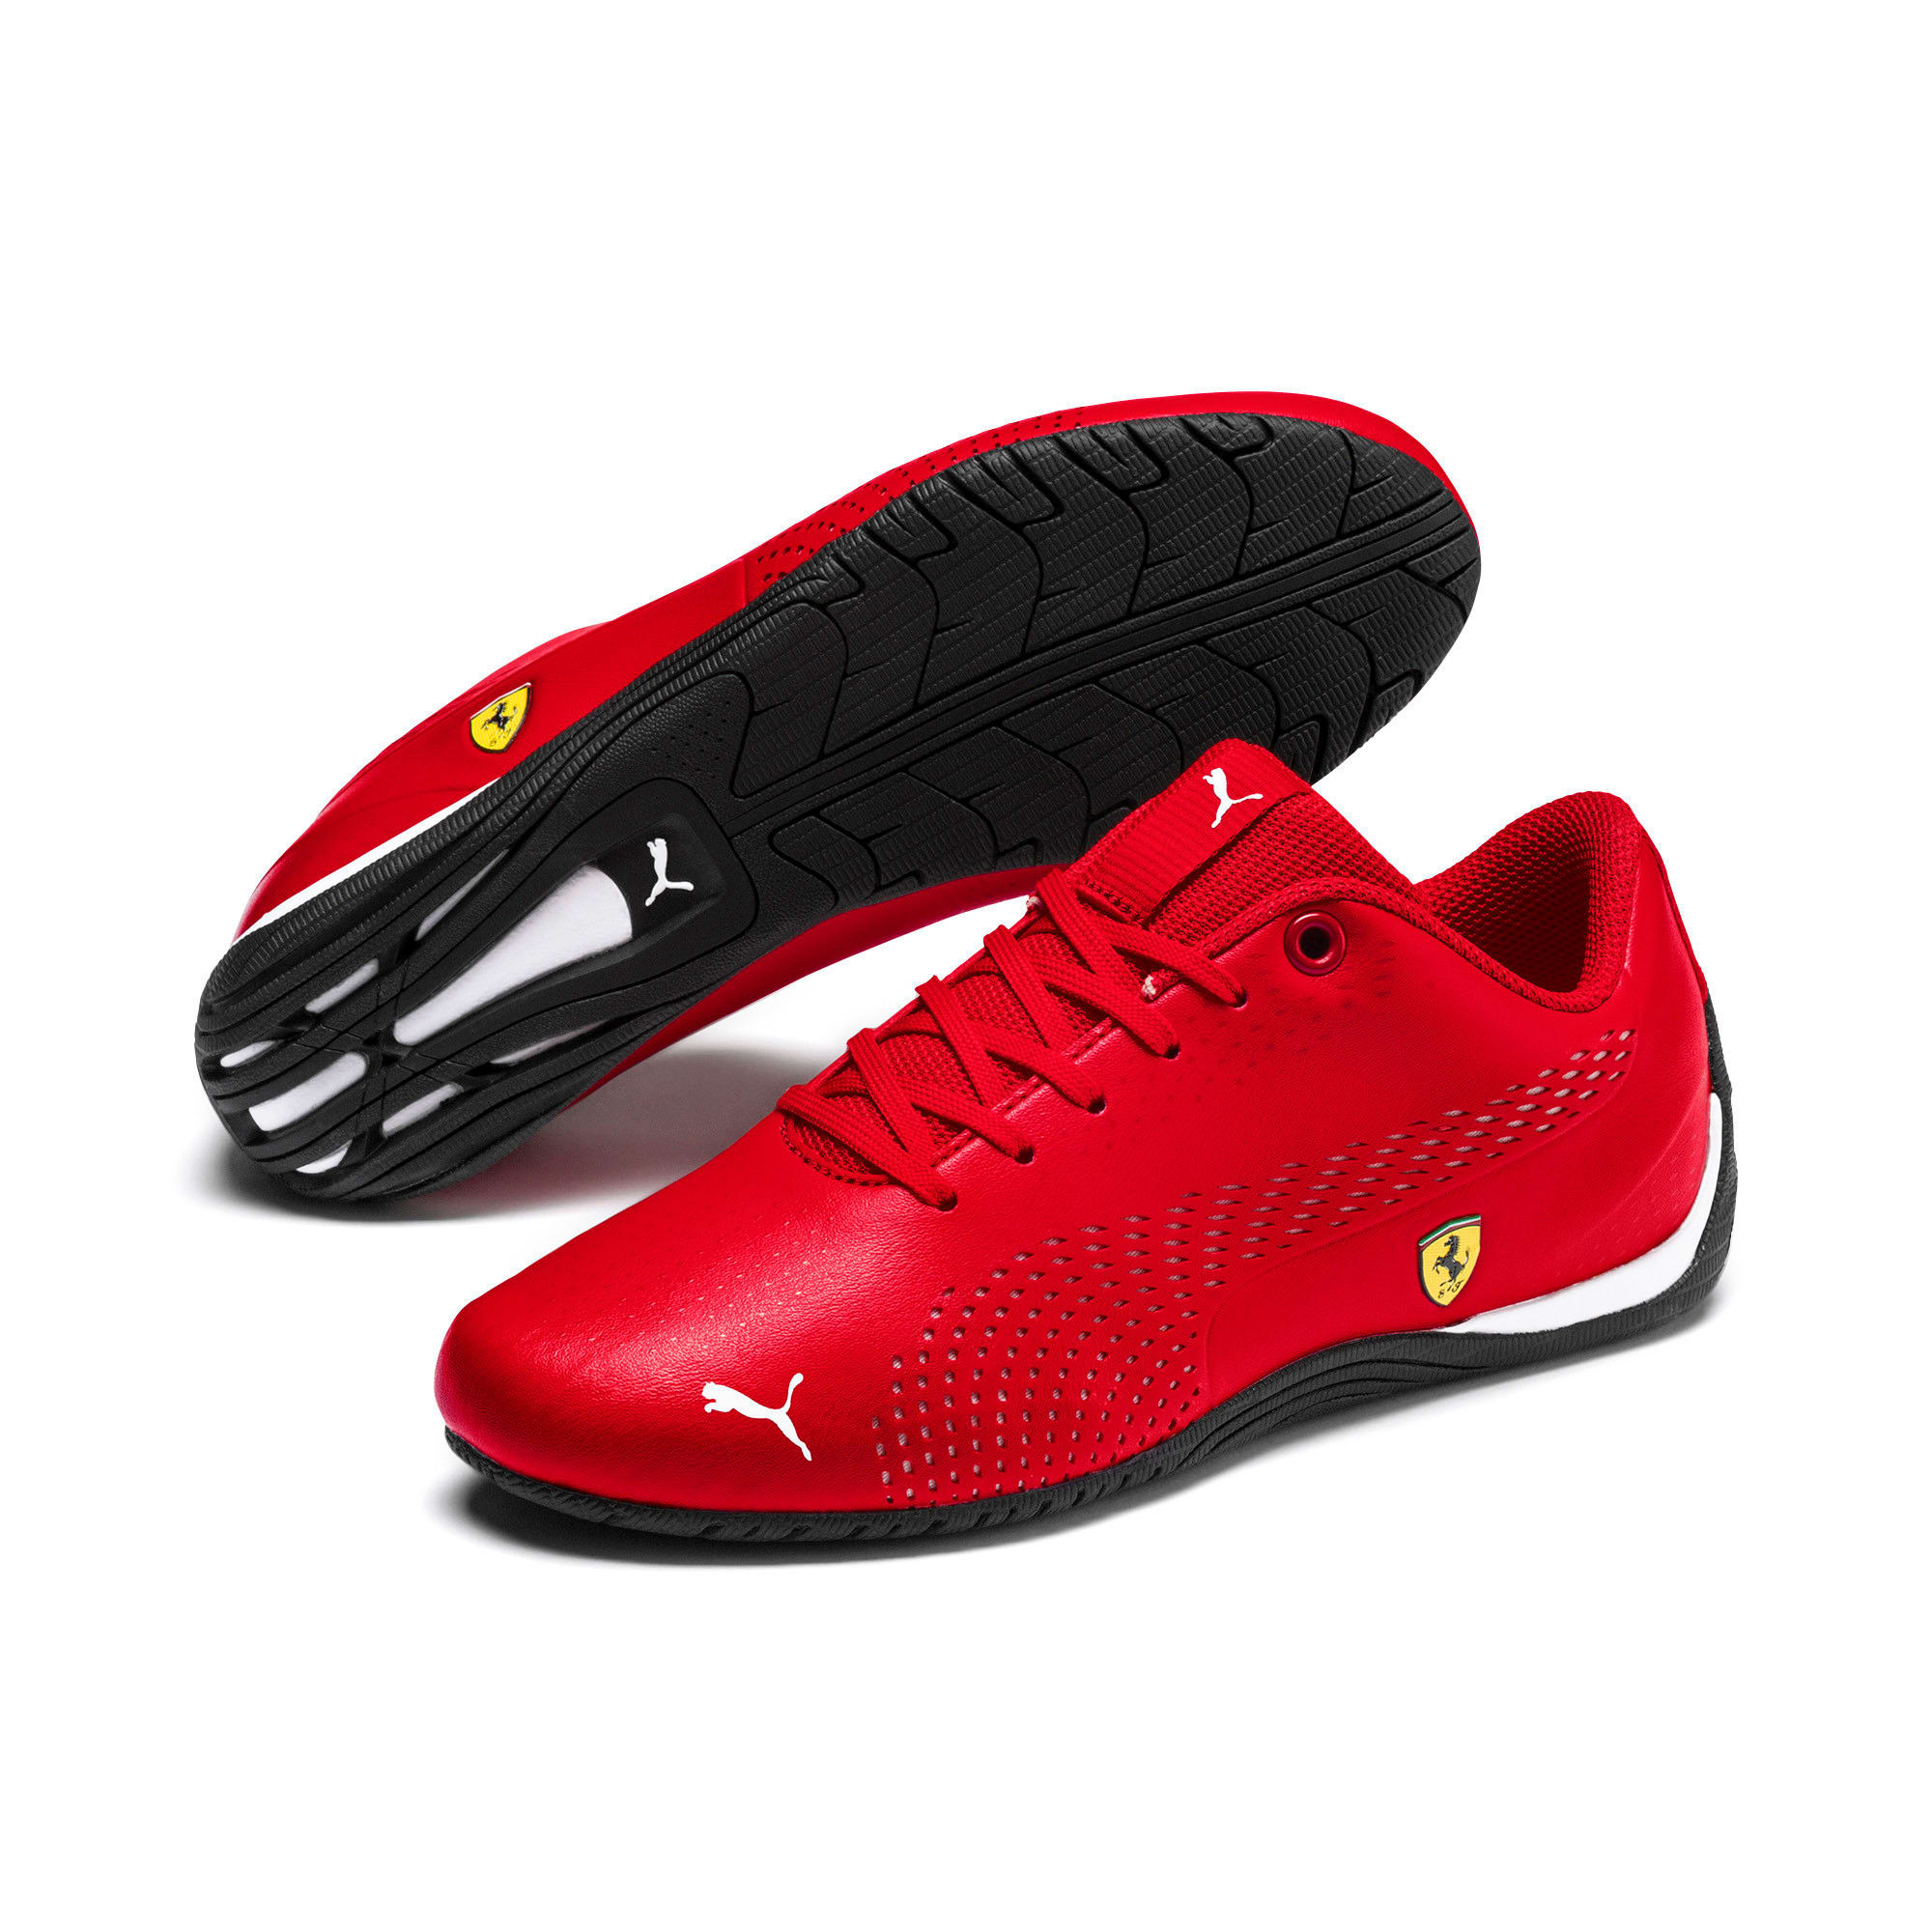 Thumbnail 6 of Ferrari Drift Cat 5 Ultra II Youth Trainers, Rosso Corsa-Puma White, medium-IND